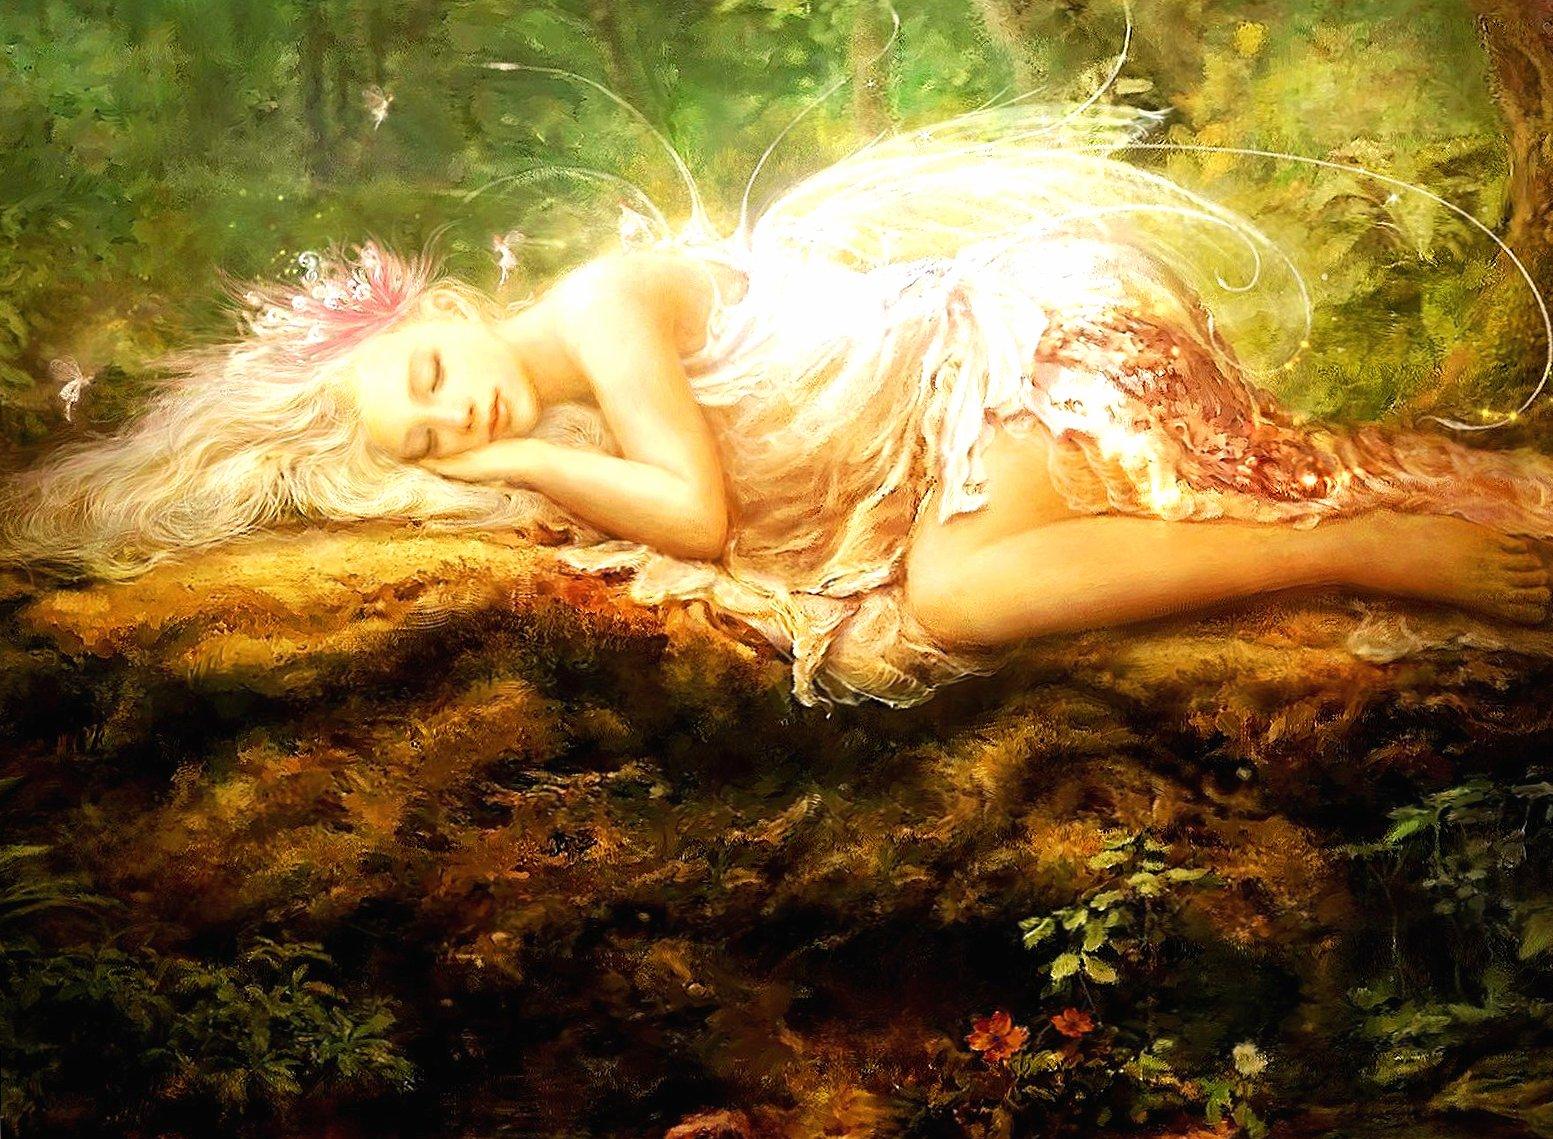 Sleeping sweet fairy wallpapers HD quality